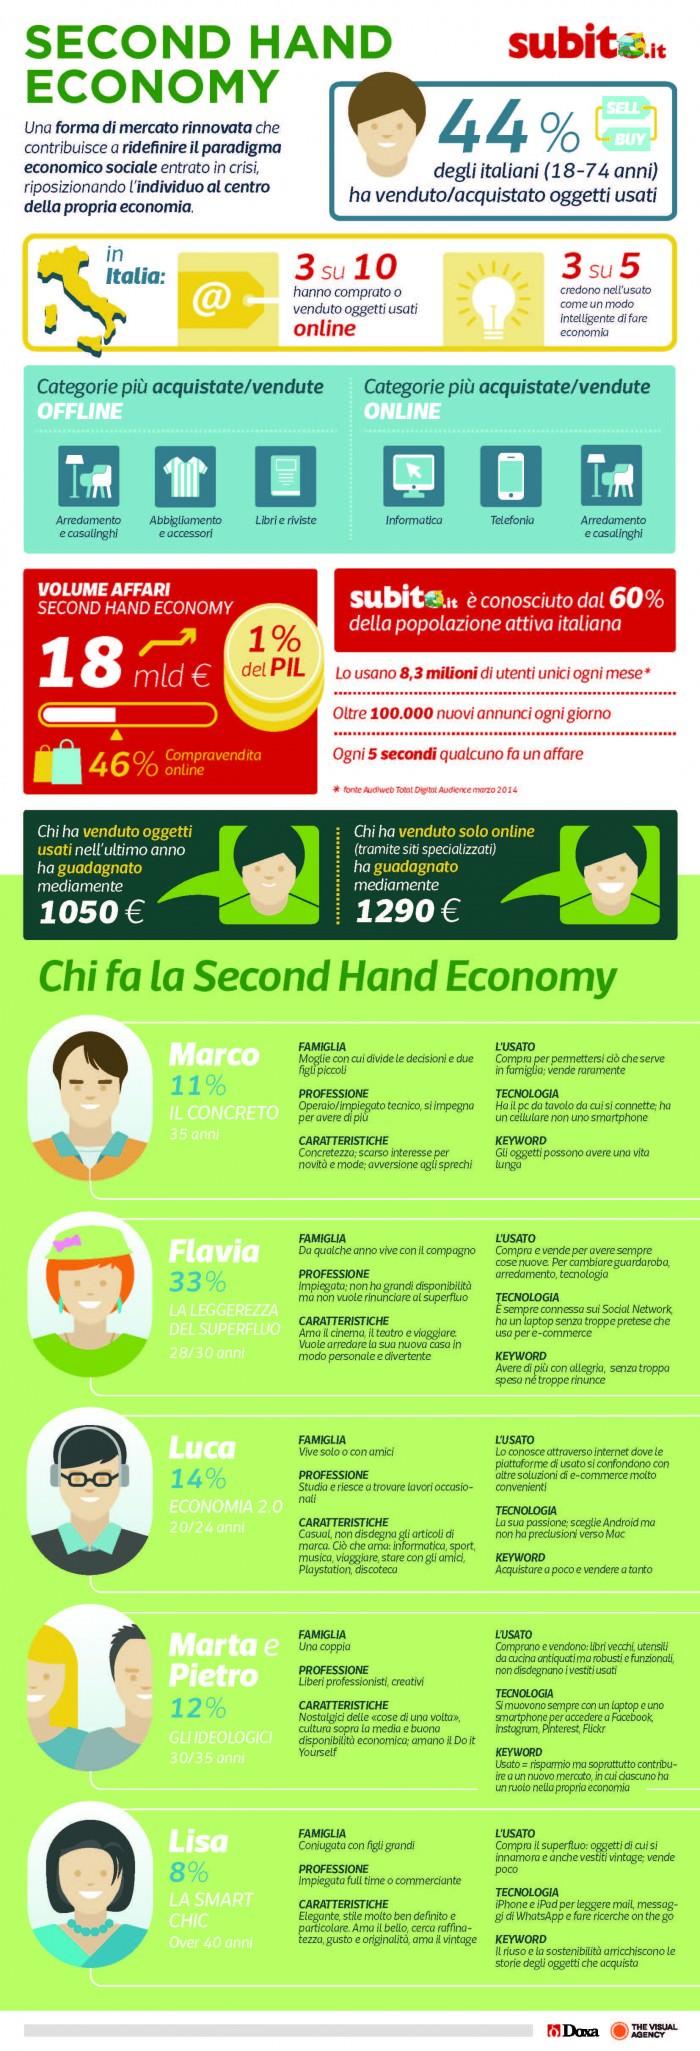 SECOND HAND ECONOMY doxa